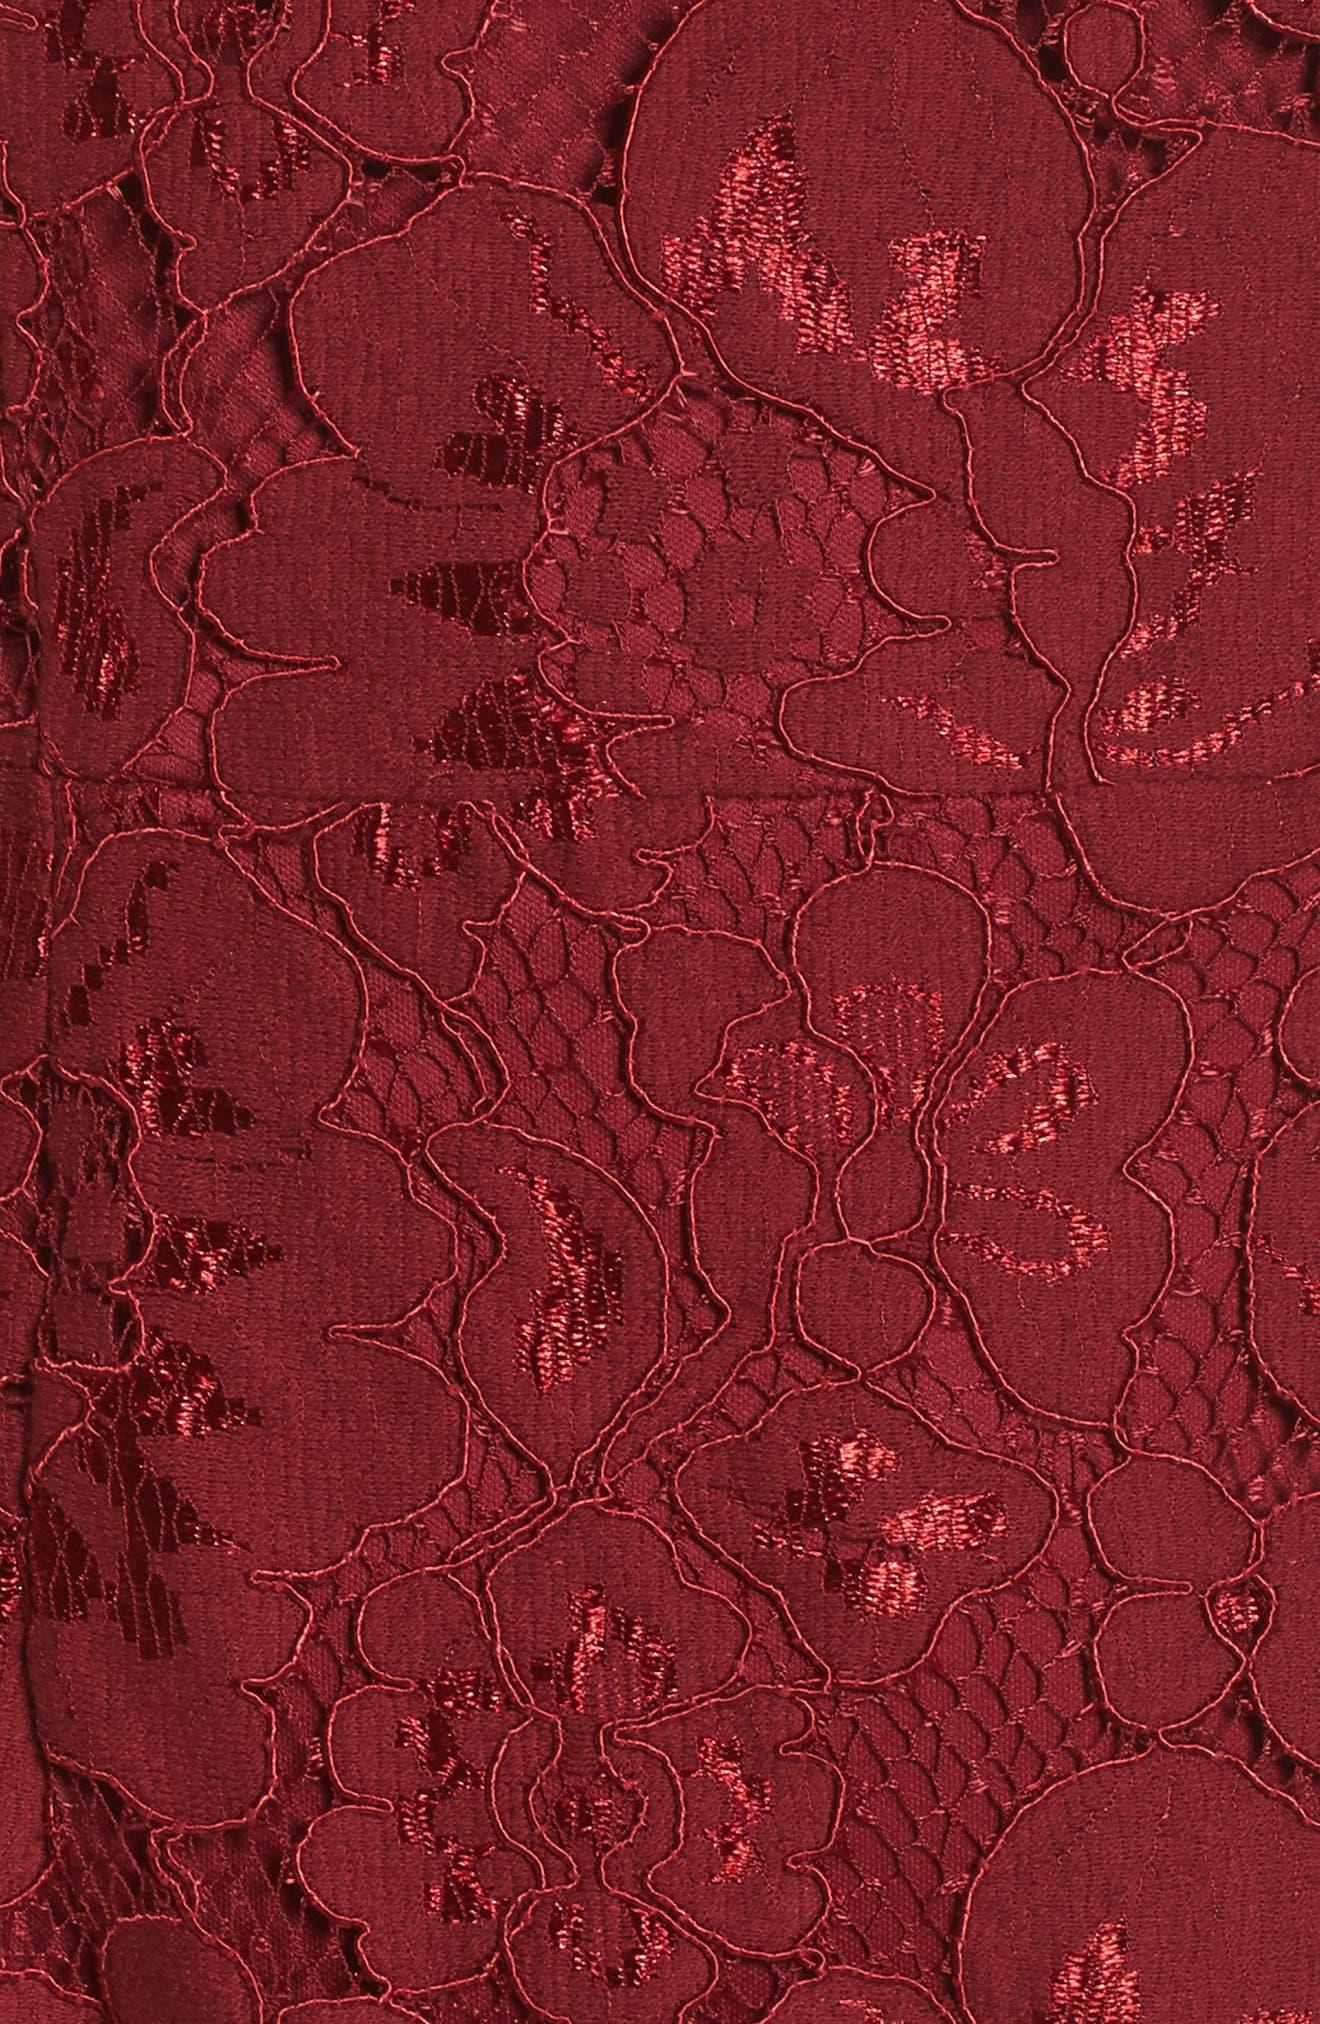 Lace Sheath Dress,                             Alternate thumbnail 7, color,